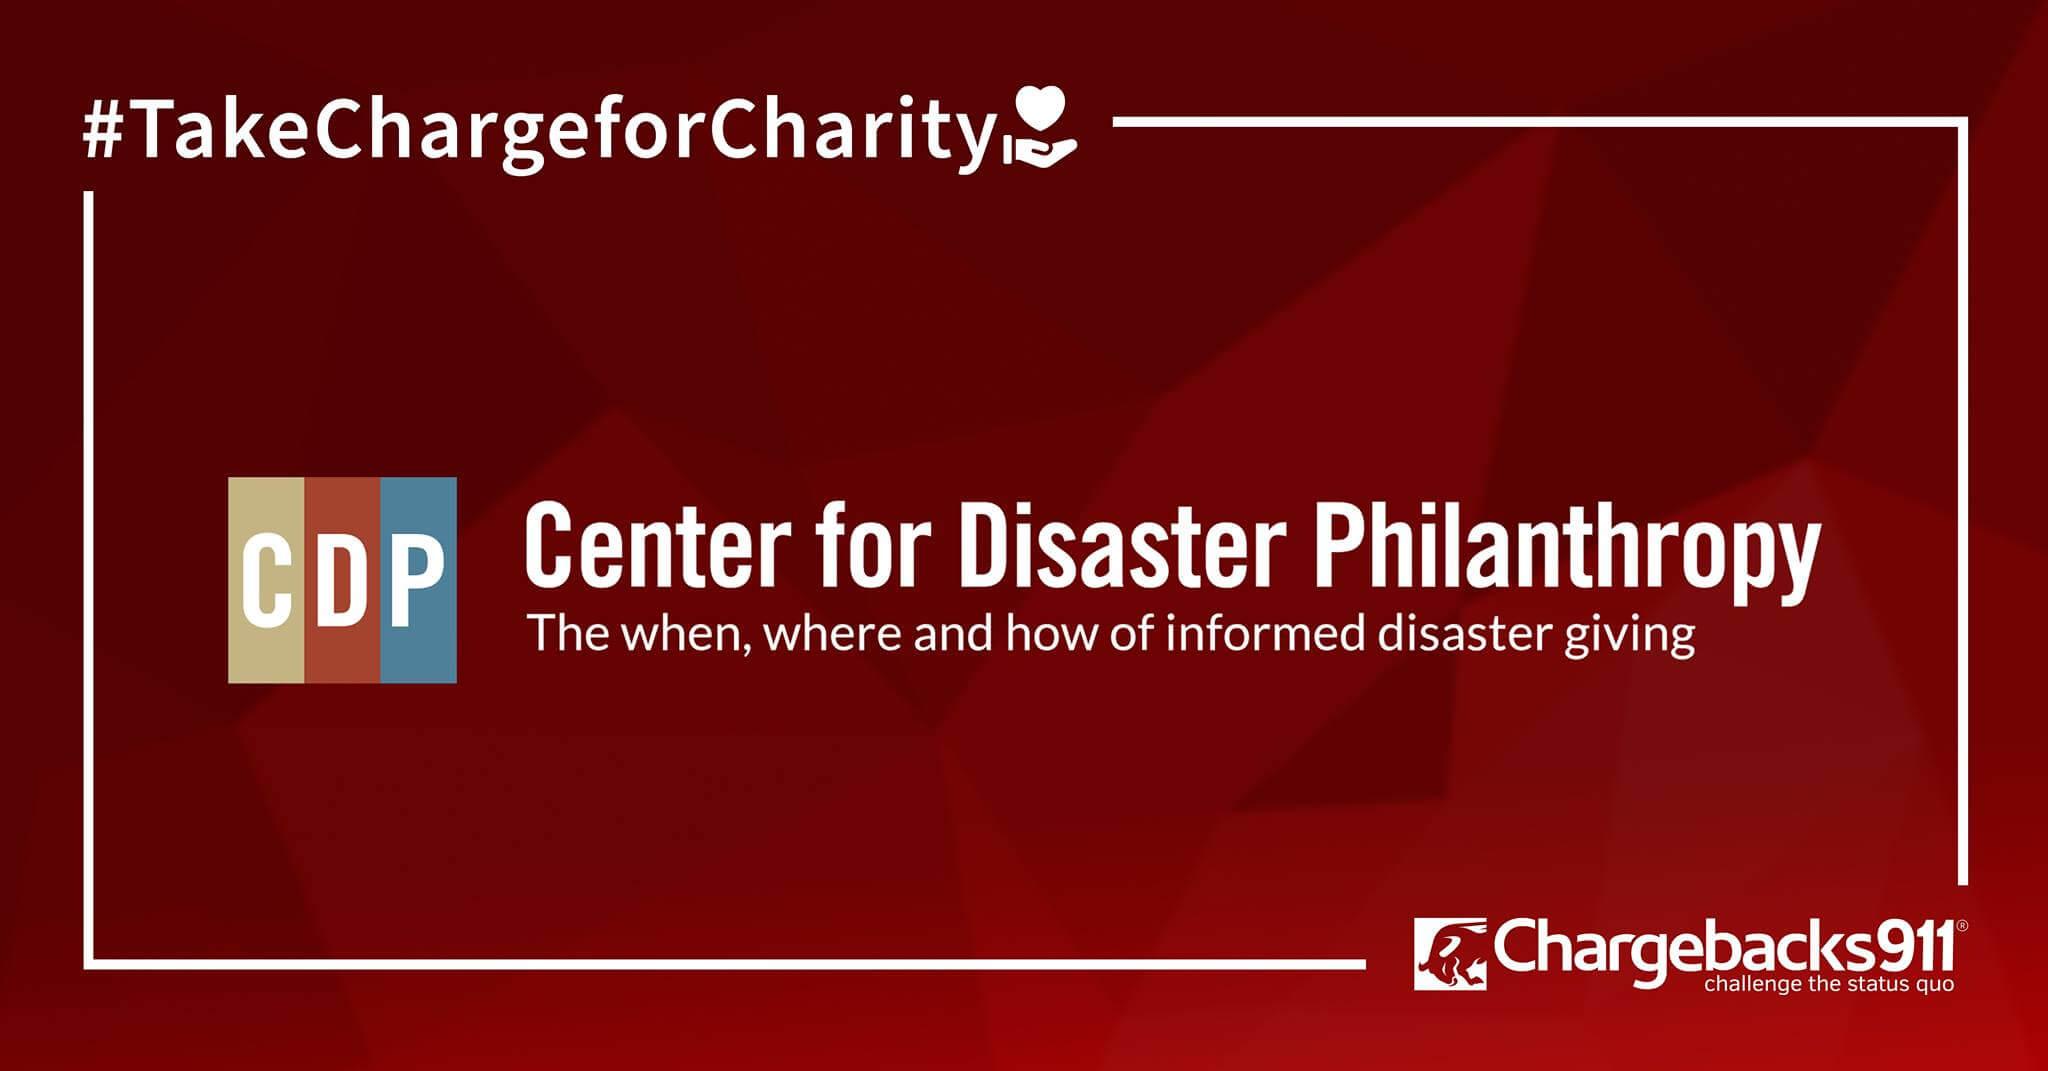 Center for Disaster Philanthropy